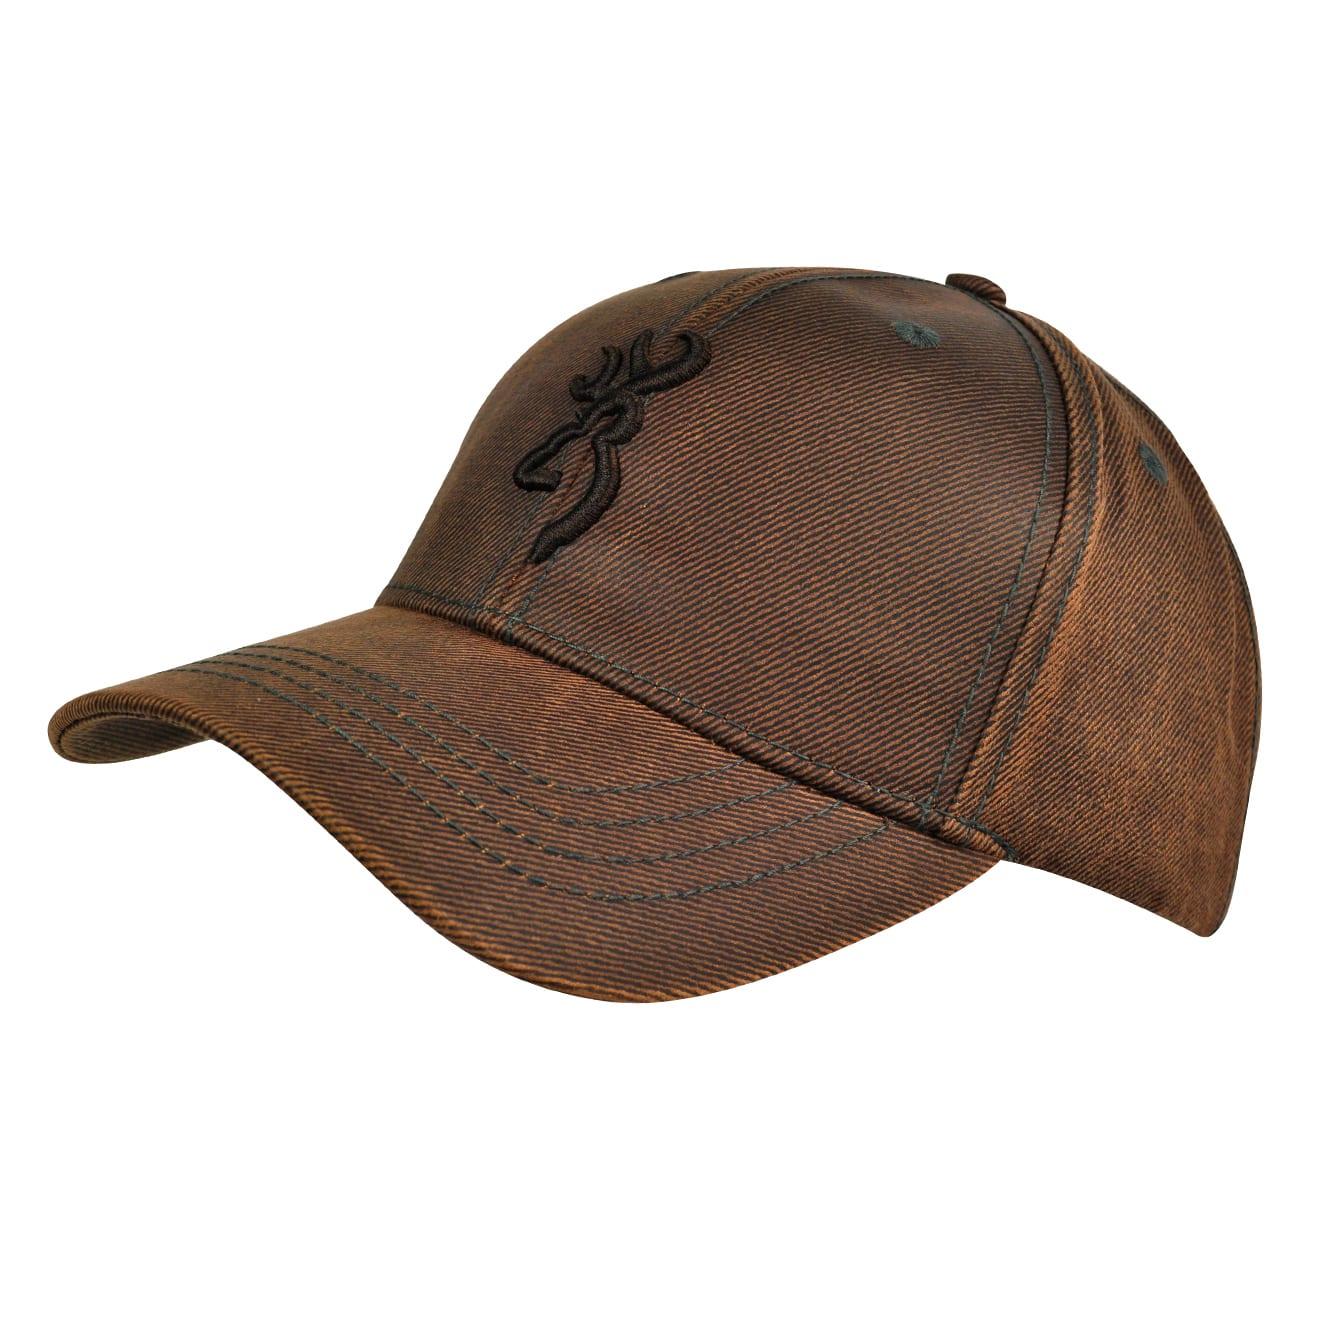 0f9c80d9 ... ebay browning rhino hide cap 3f491 7b110